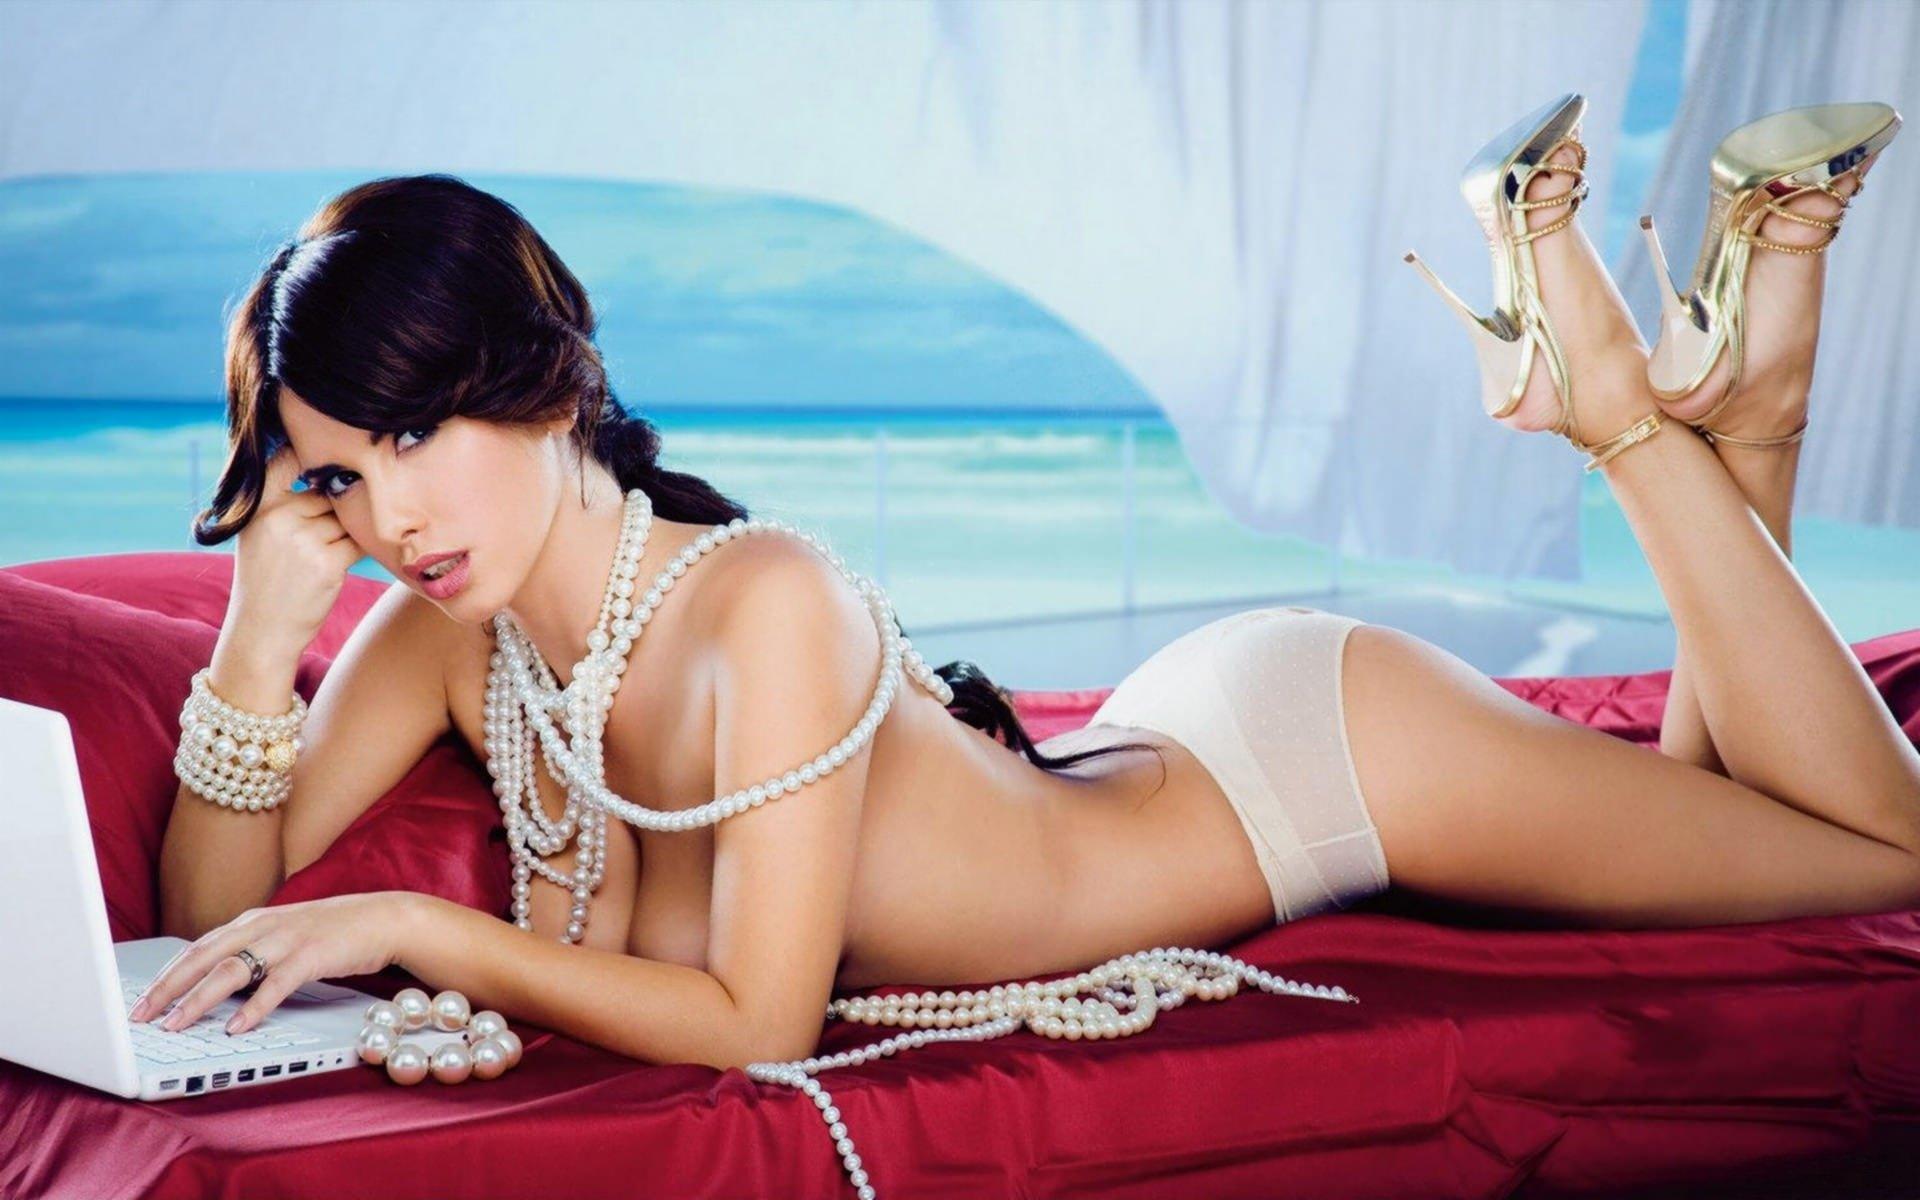 eroticheskie-foto-biznes-devushek-imeet